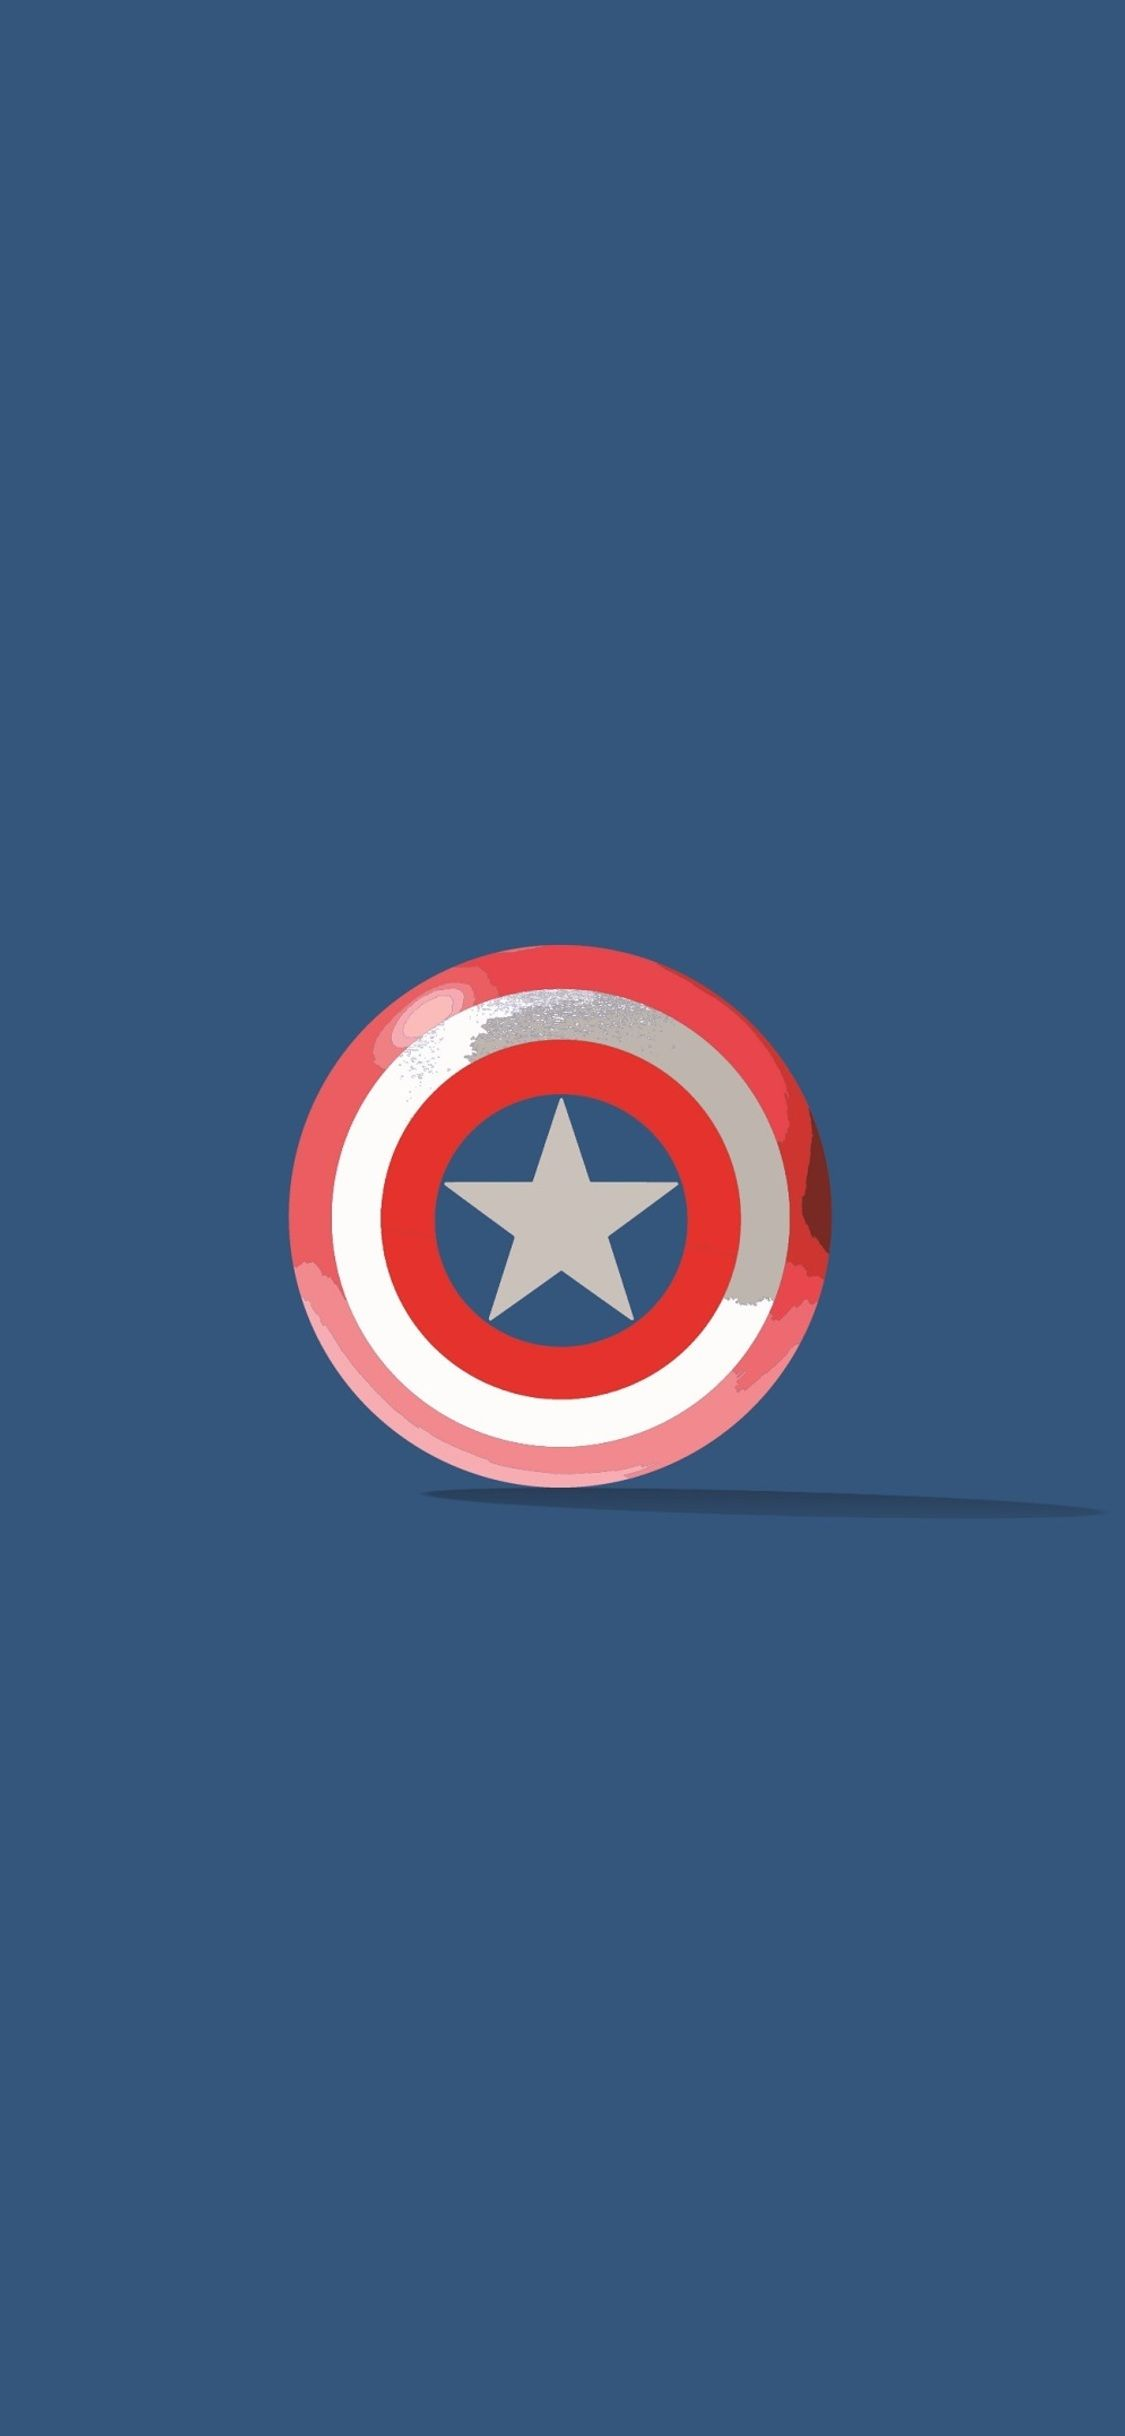 Captain America Iphone 6 Wallpaper - Captain America , HD Wallpaper & Backgrounds